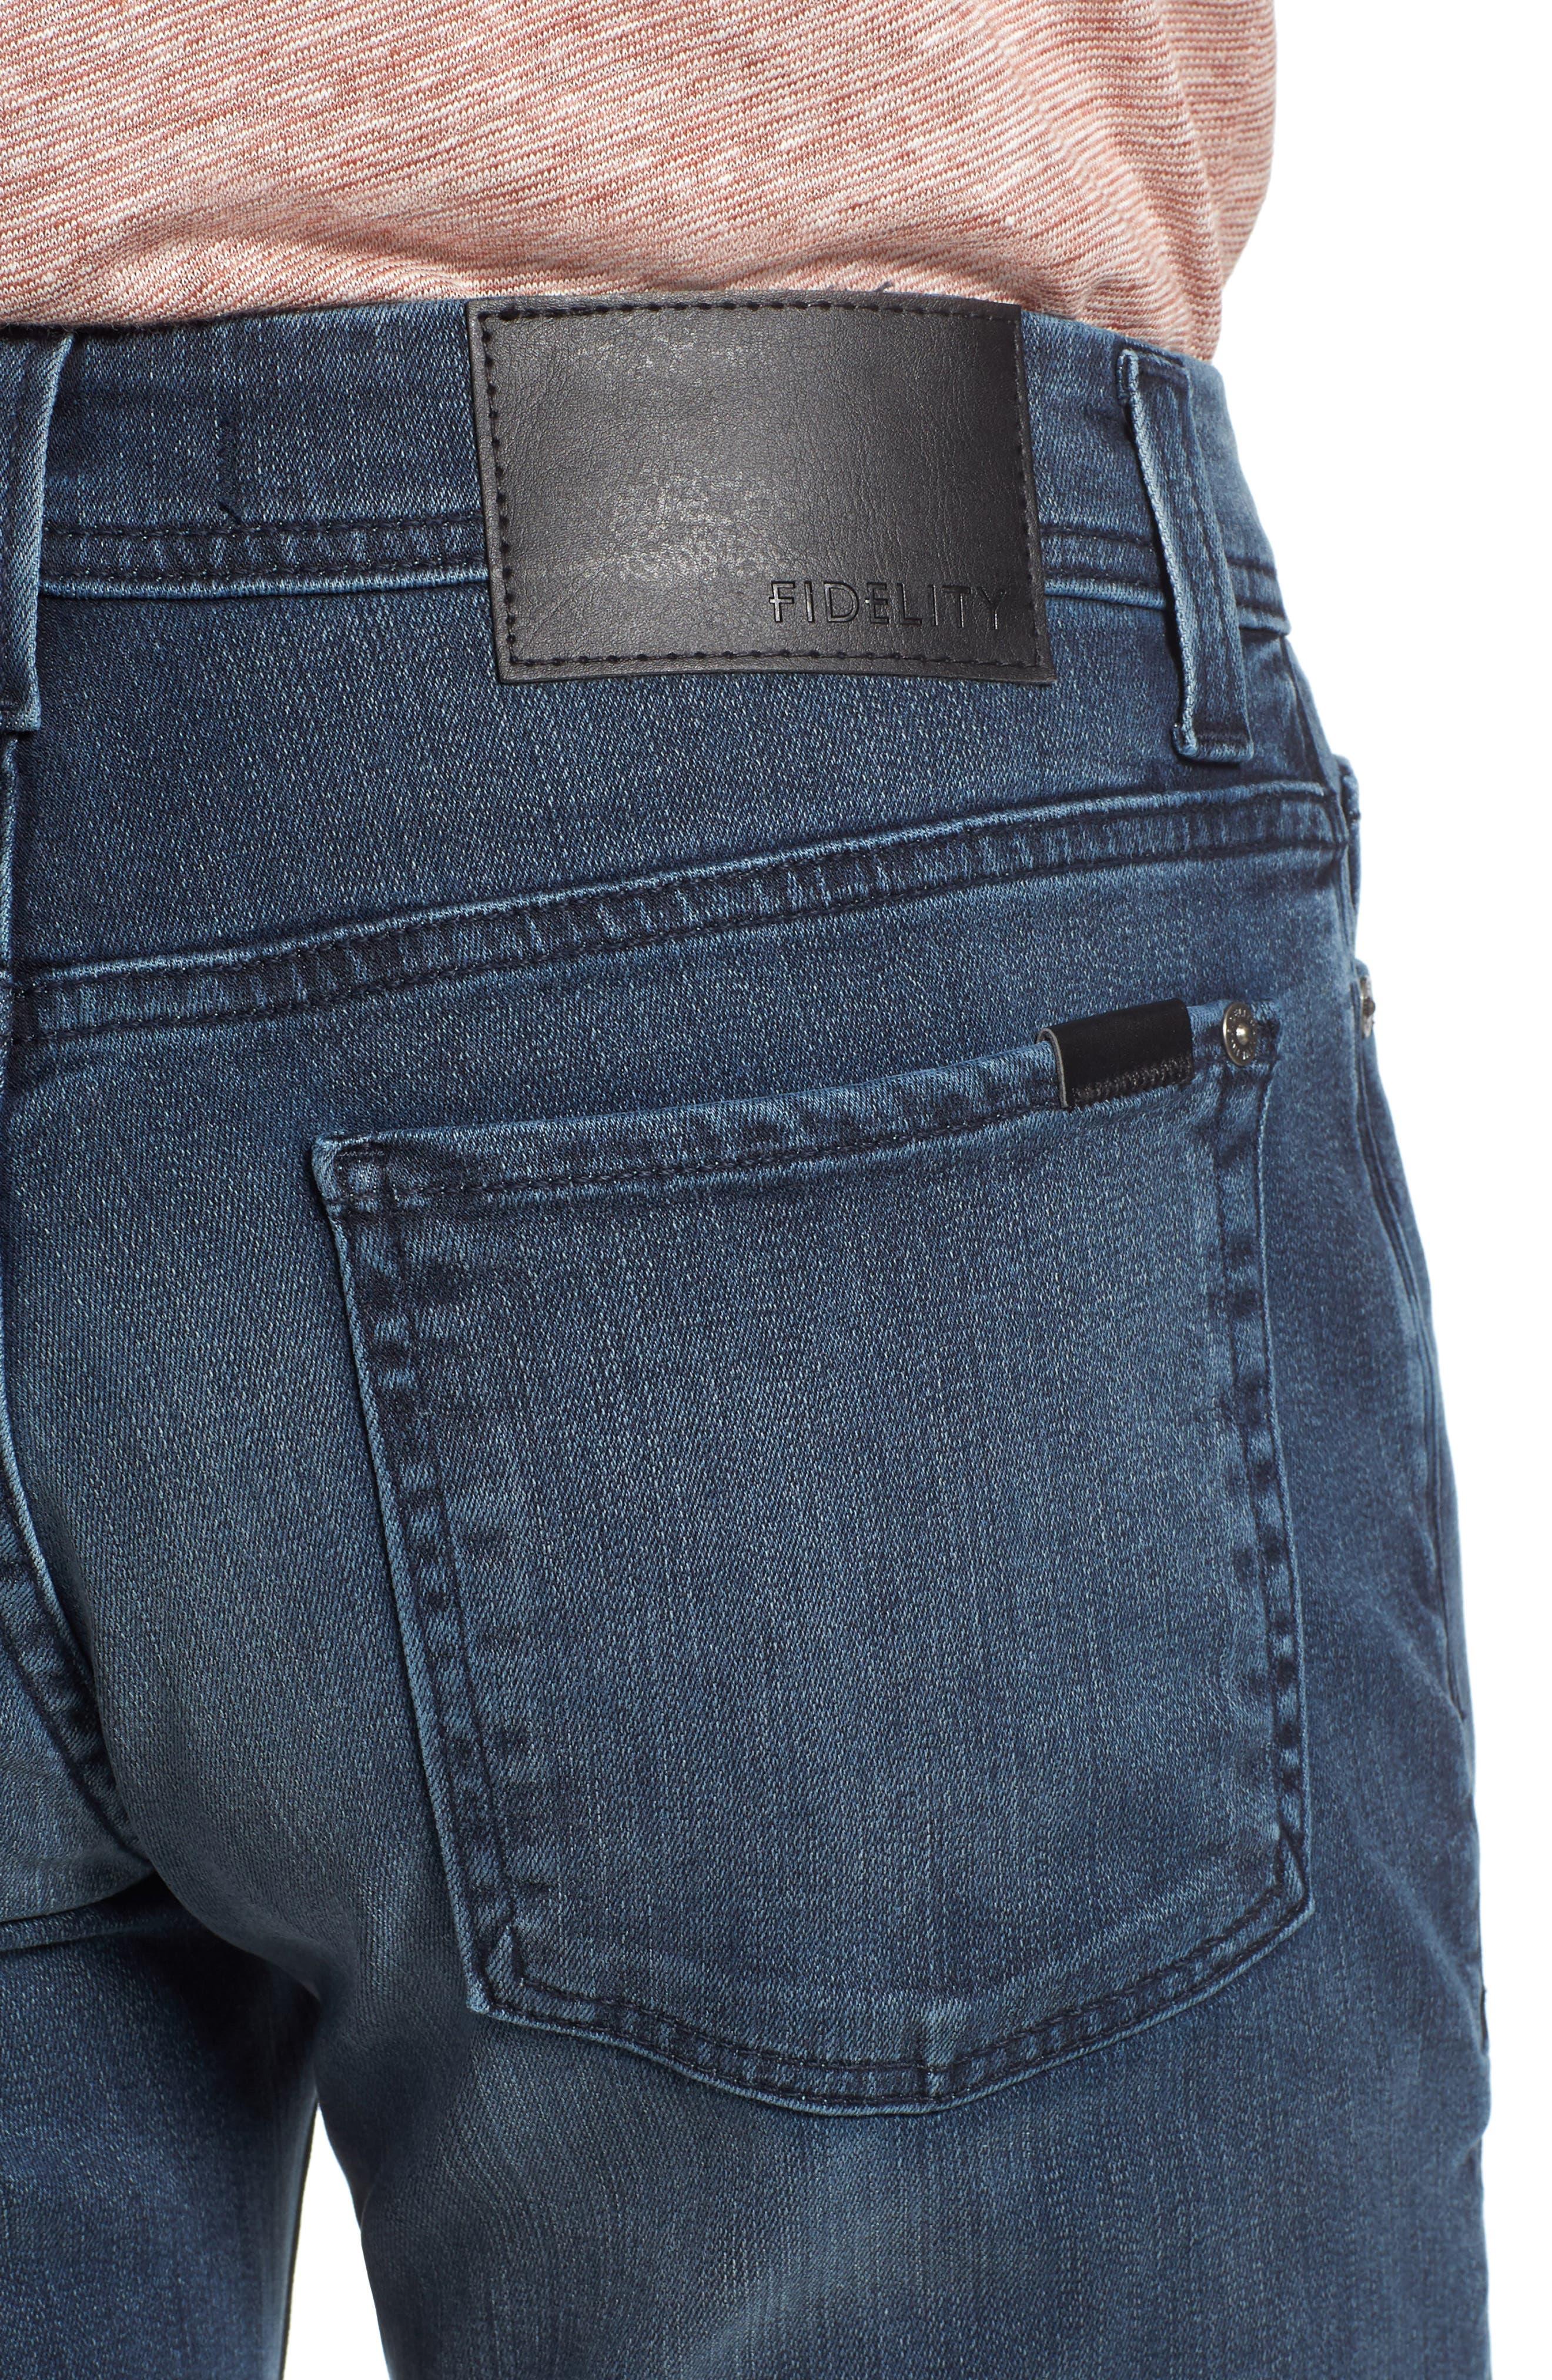 Jimmy Slim Straight Leg Jeans,                             Alternate thumbnail 4, color,                             Lexicon